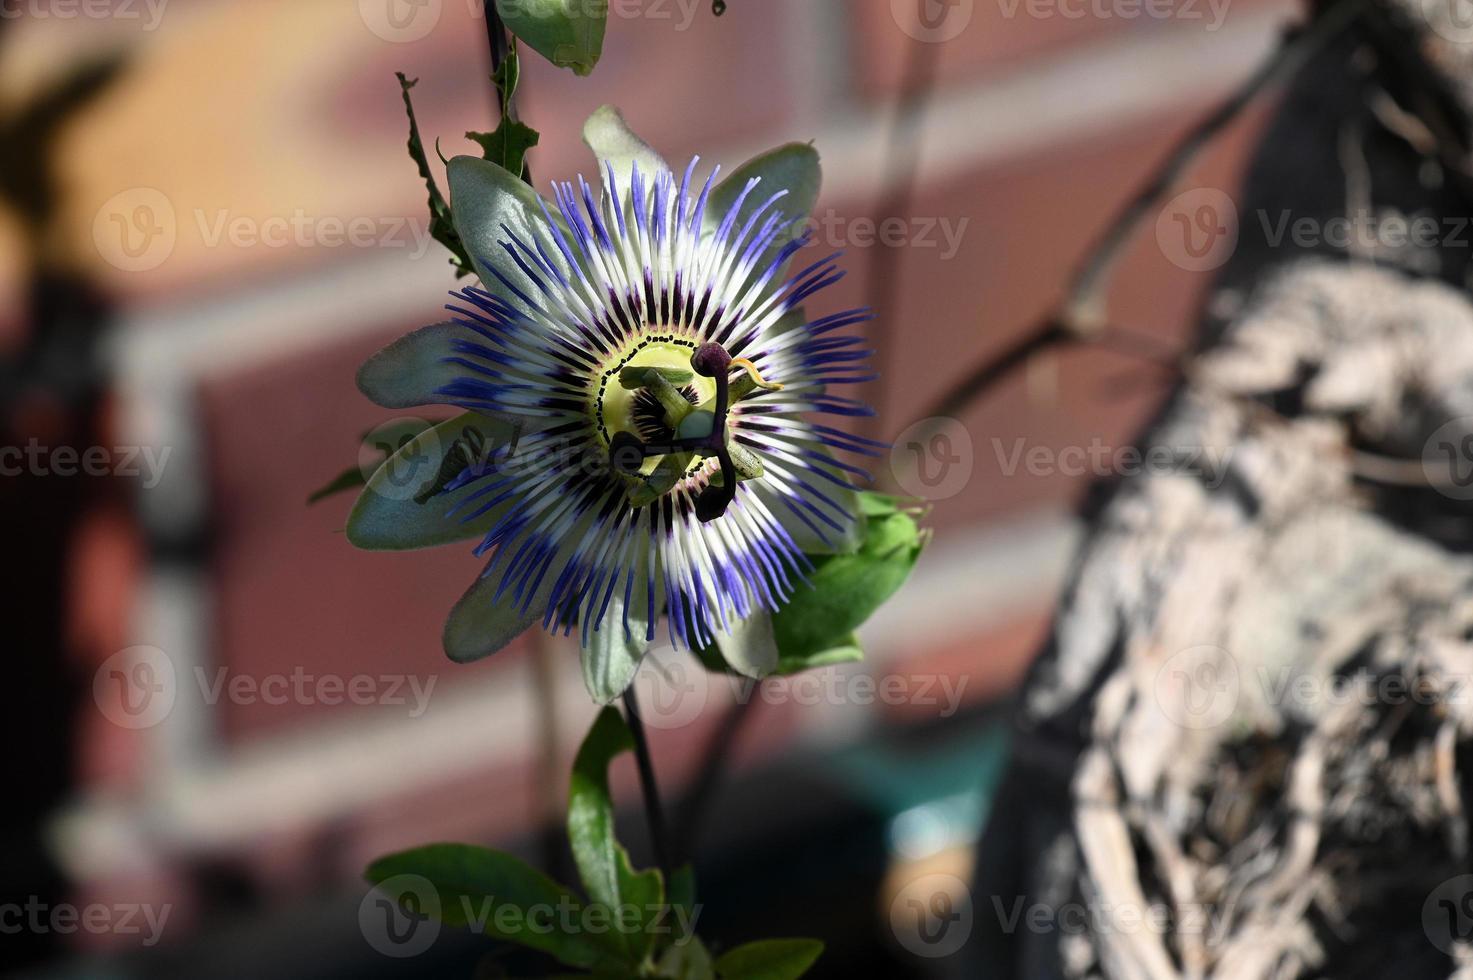 plante grimpante en fleurs passiflore photo